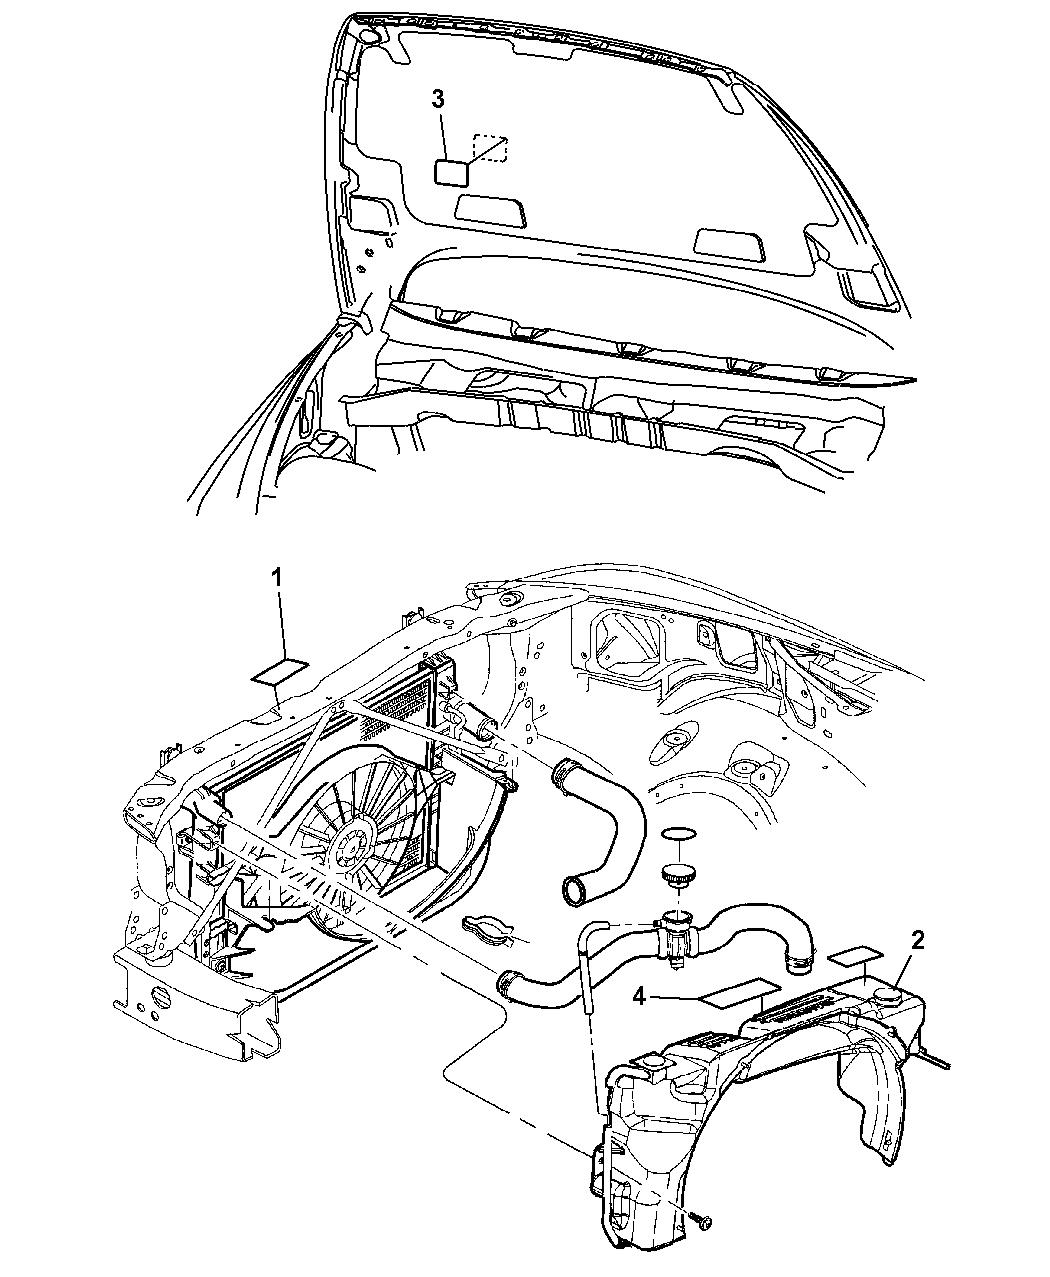 2007 Chrysler Aspen Engine Compartment